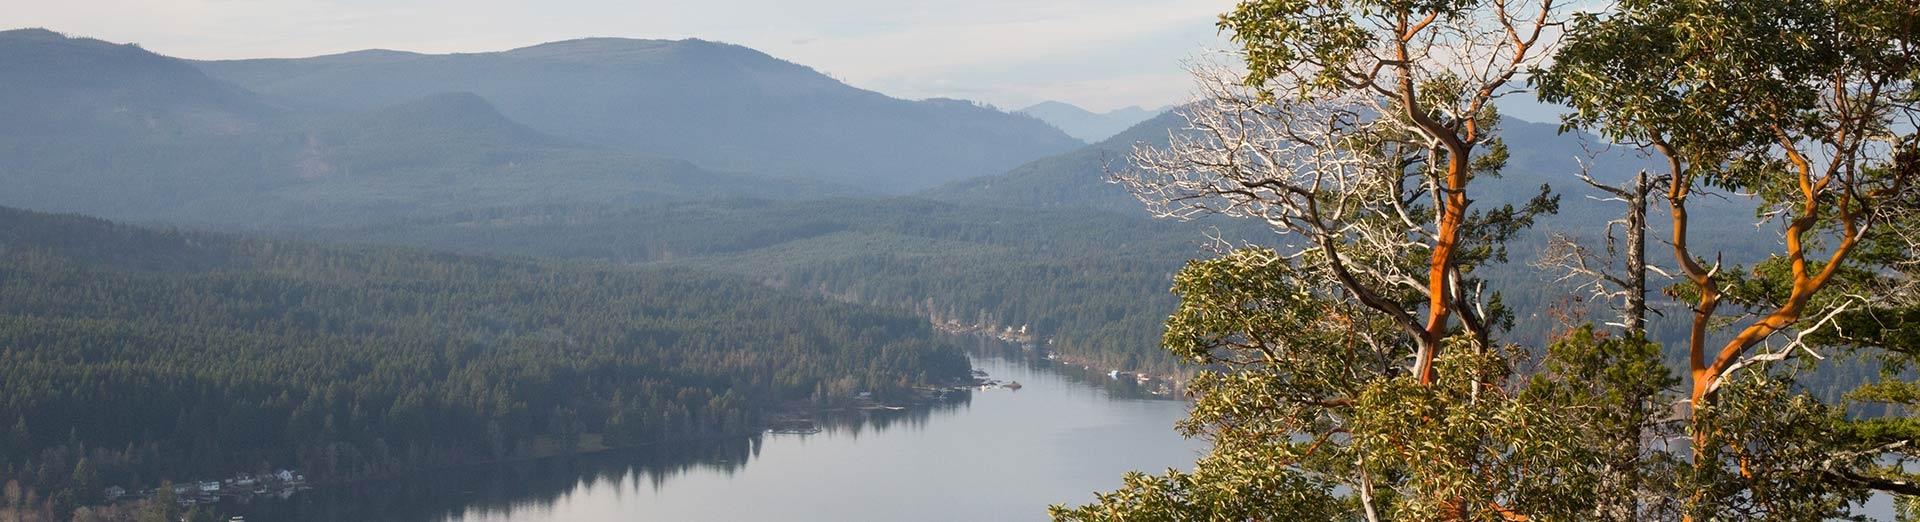 BC Supreme Court orders halt to Shawnigan Soil dumping